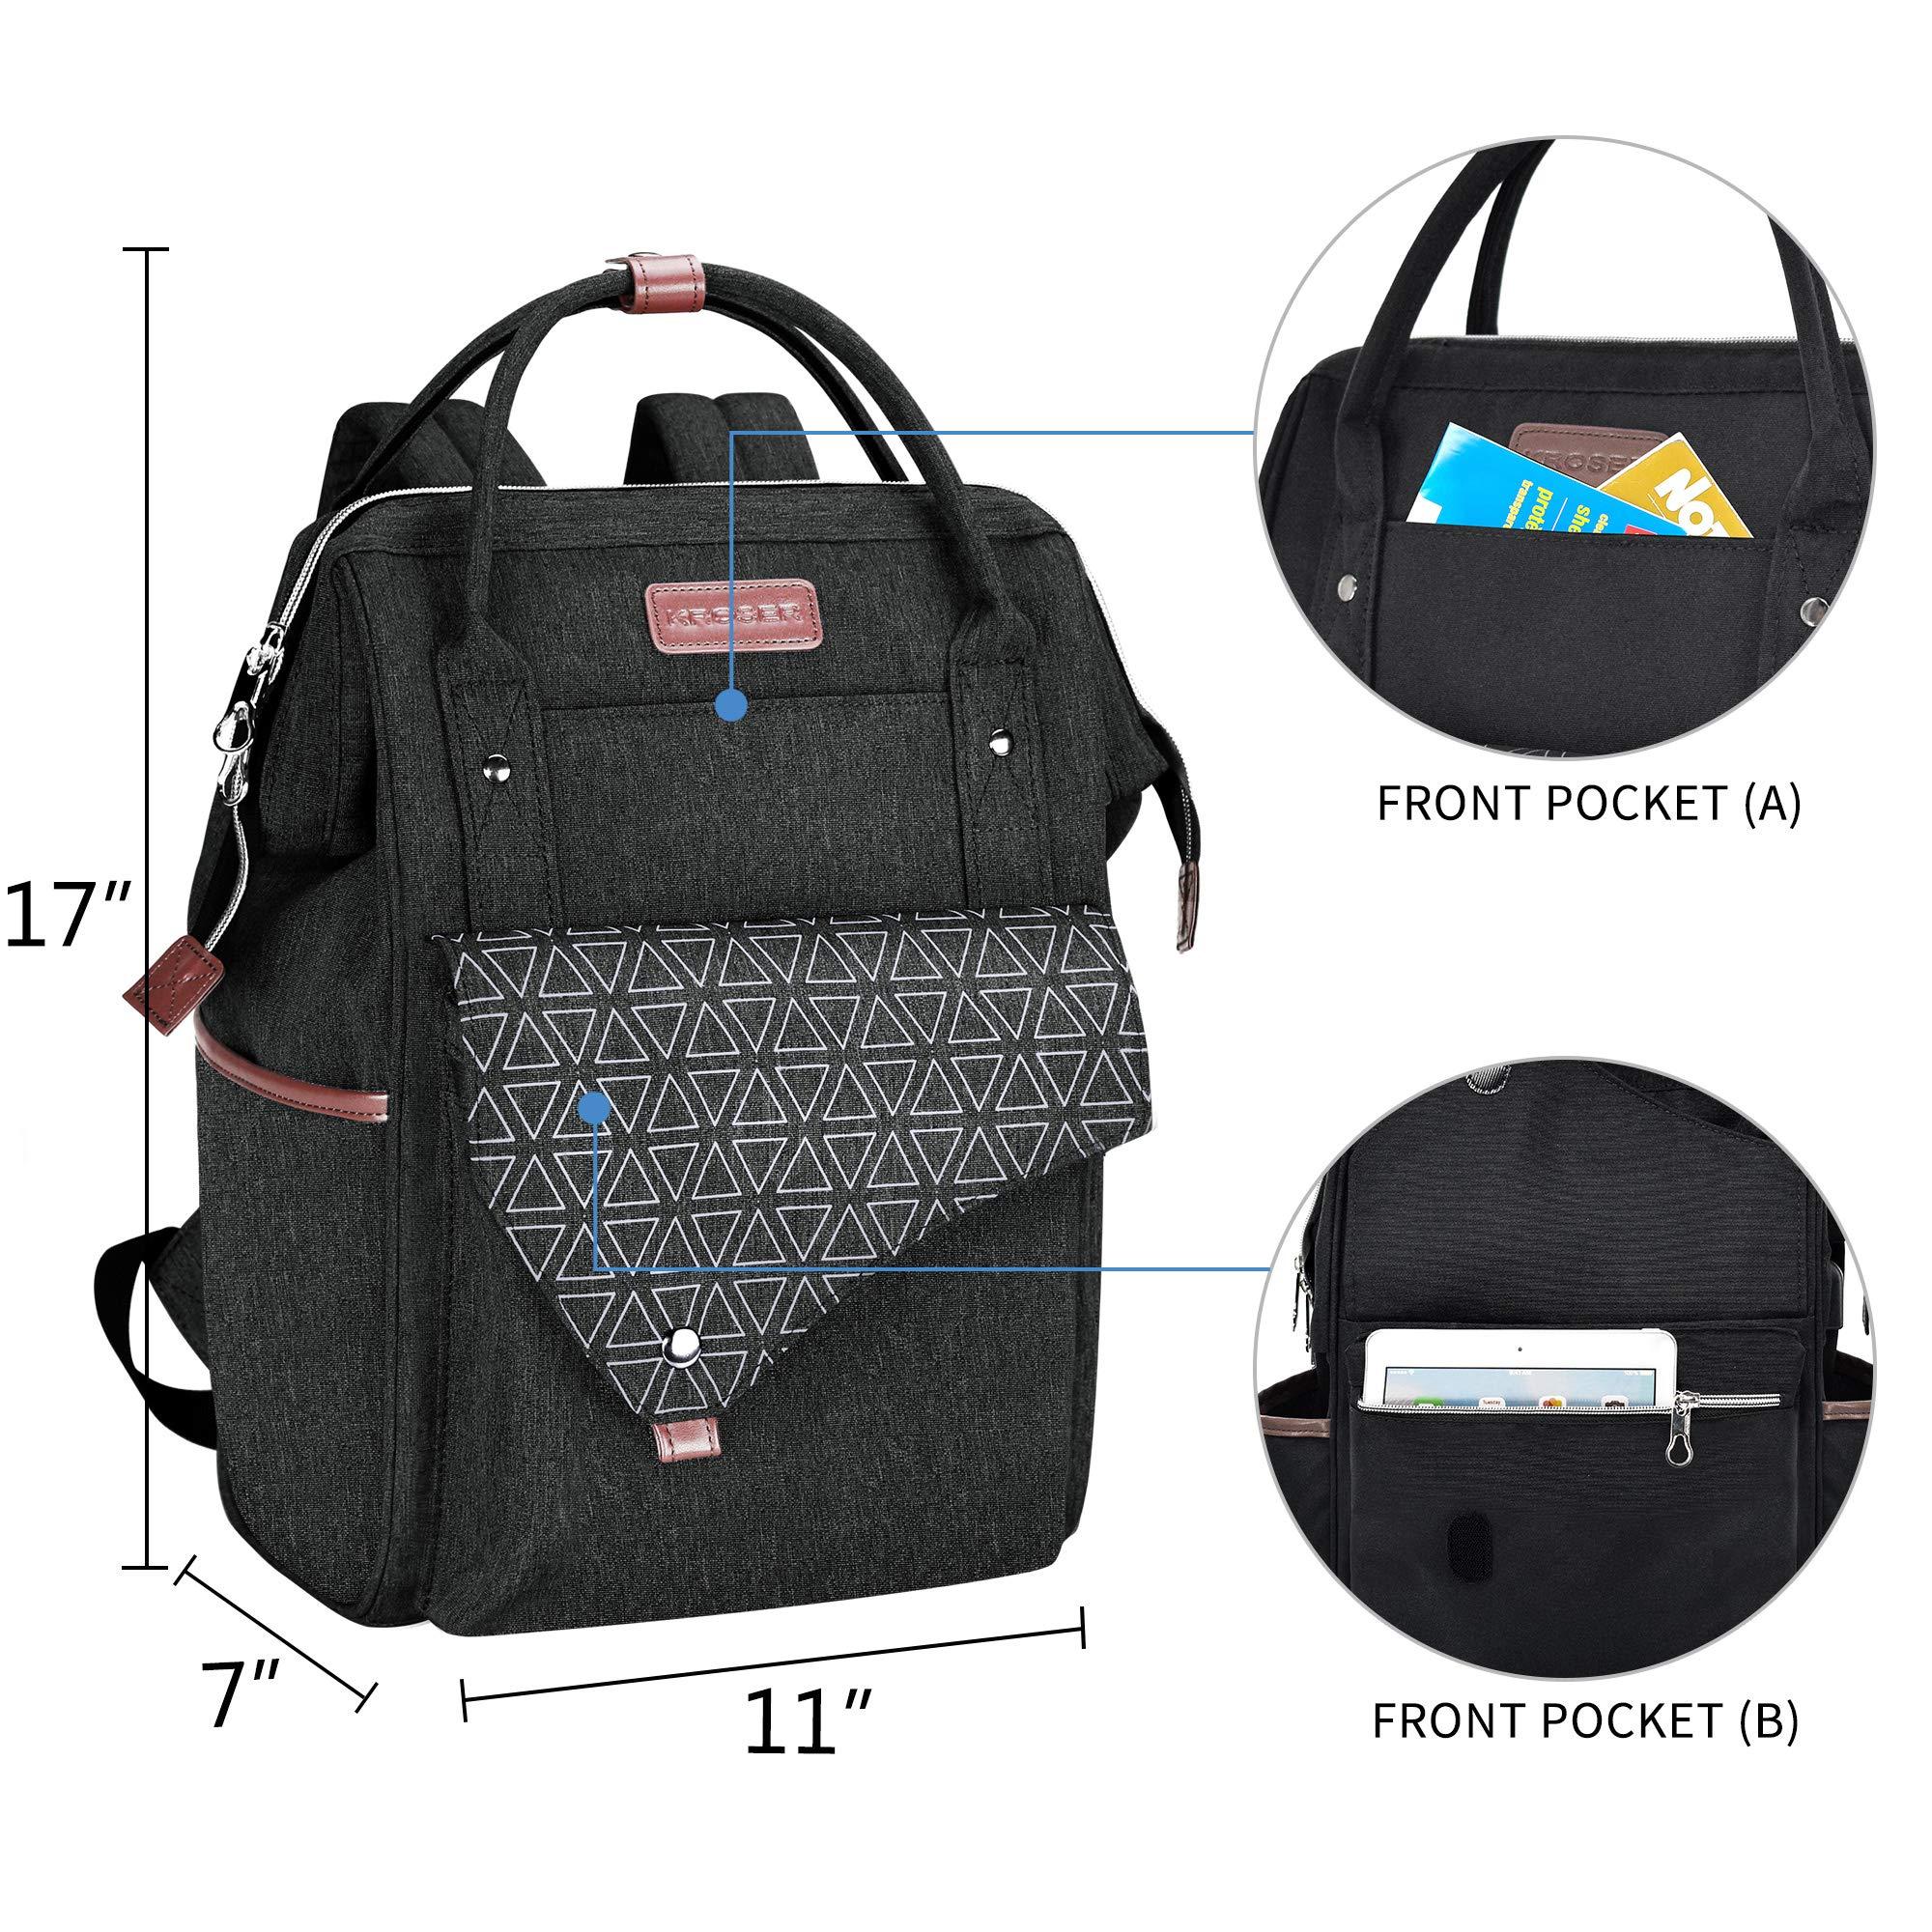 KROSER Laptop Backpack 15.6 Inch Stylish School Computer Backpack with USB Charging Port Water-repellent College Daypack Travel Business Work Bag for Women/Men-Black